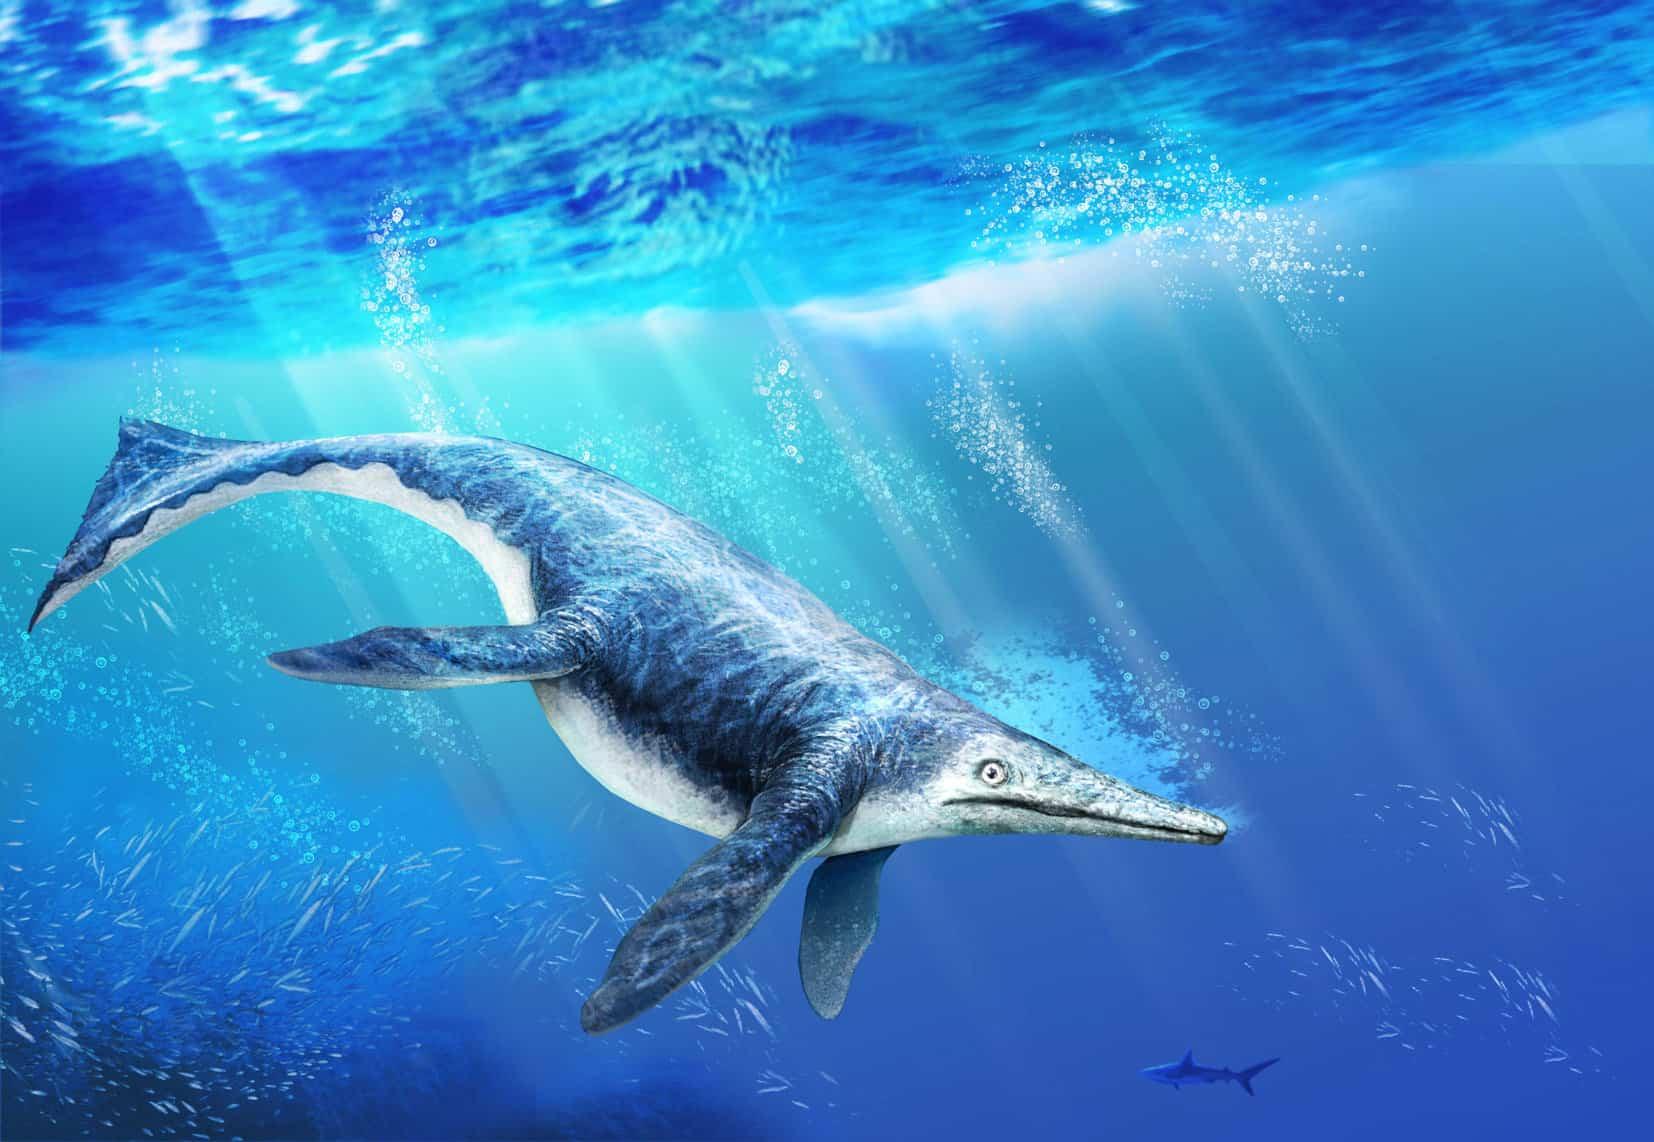 Shonisaurus by Daniele Rios Boleeiro